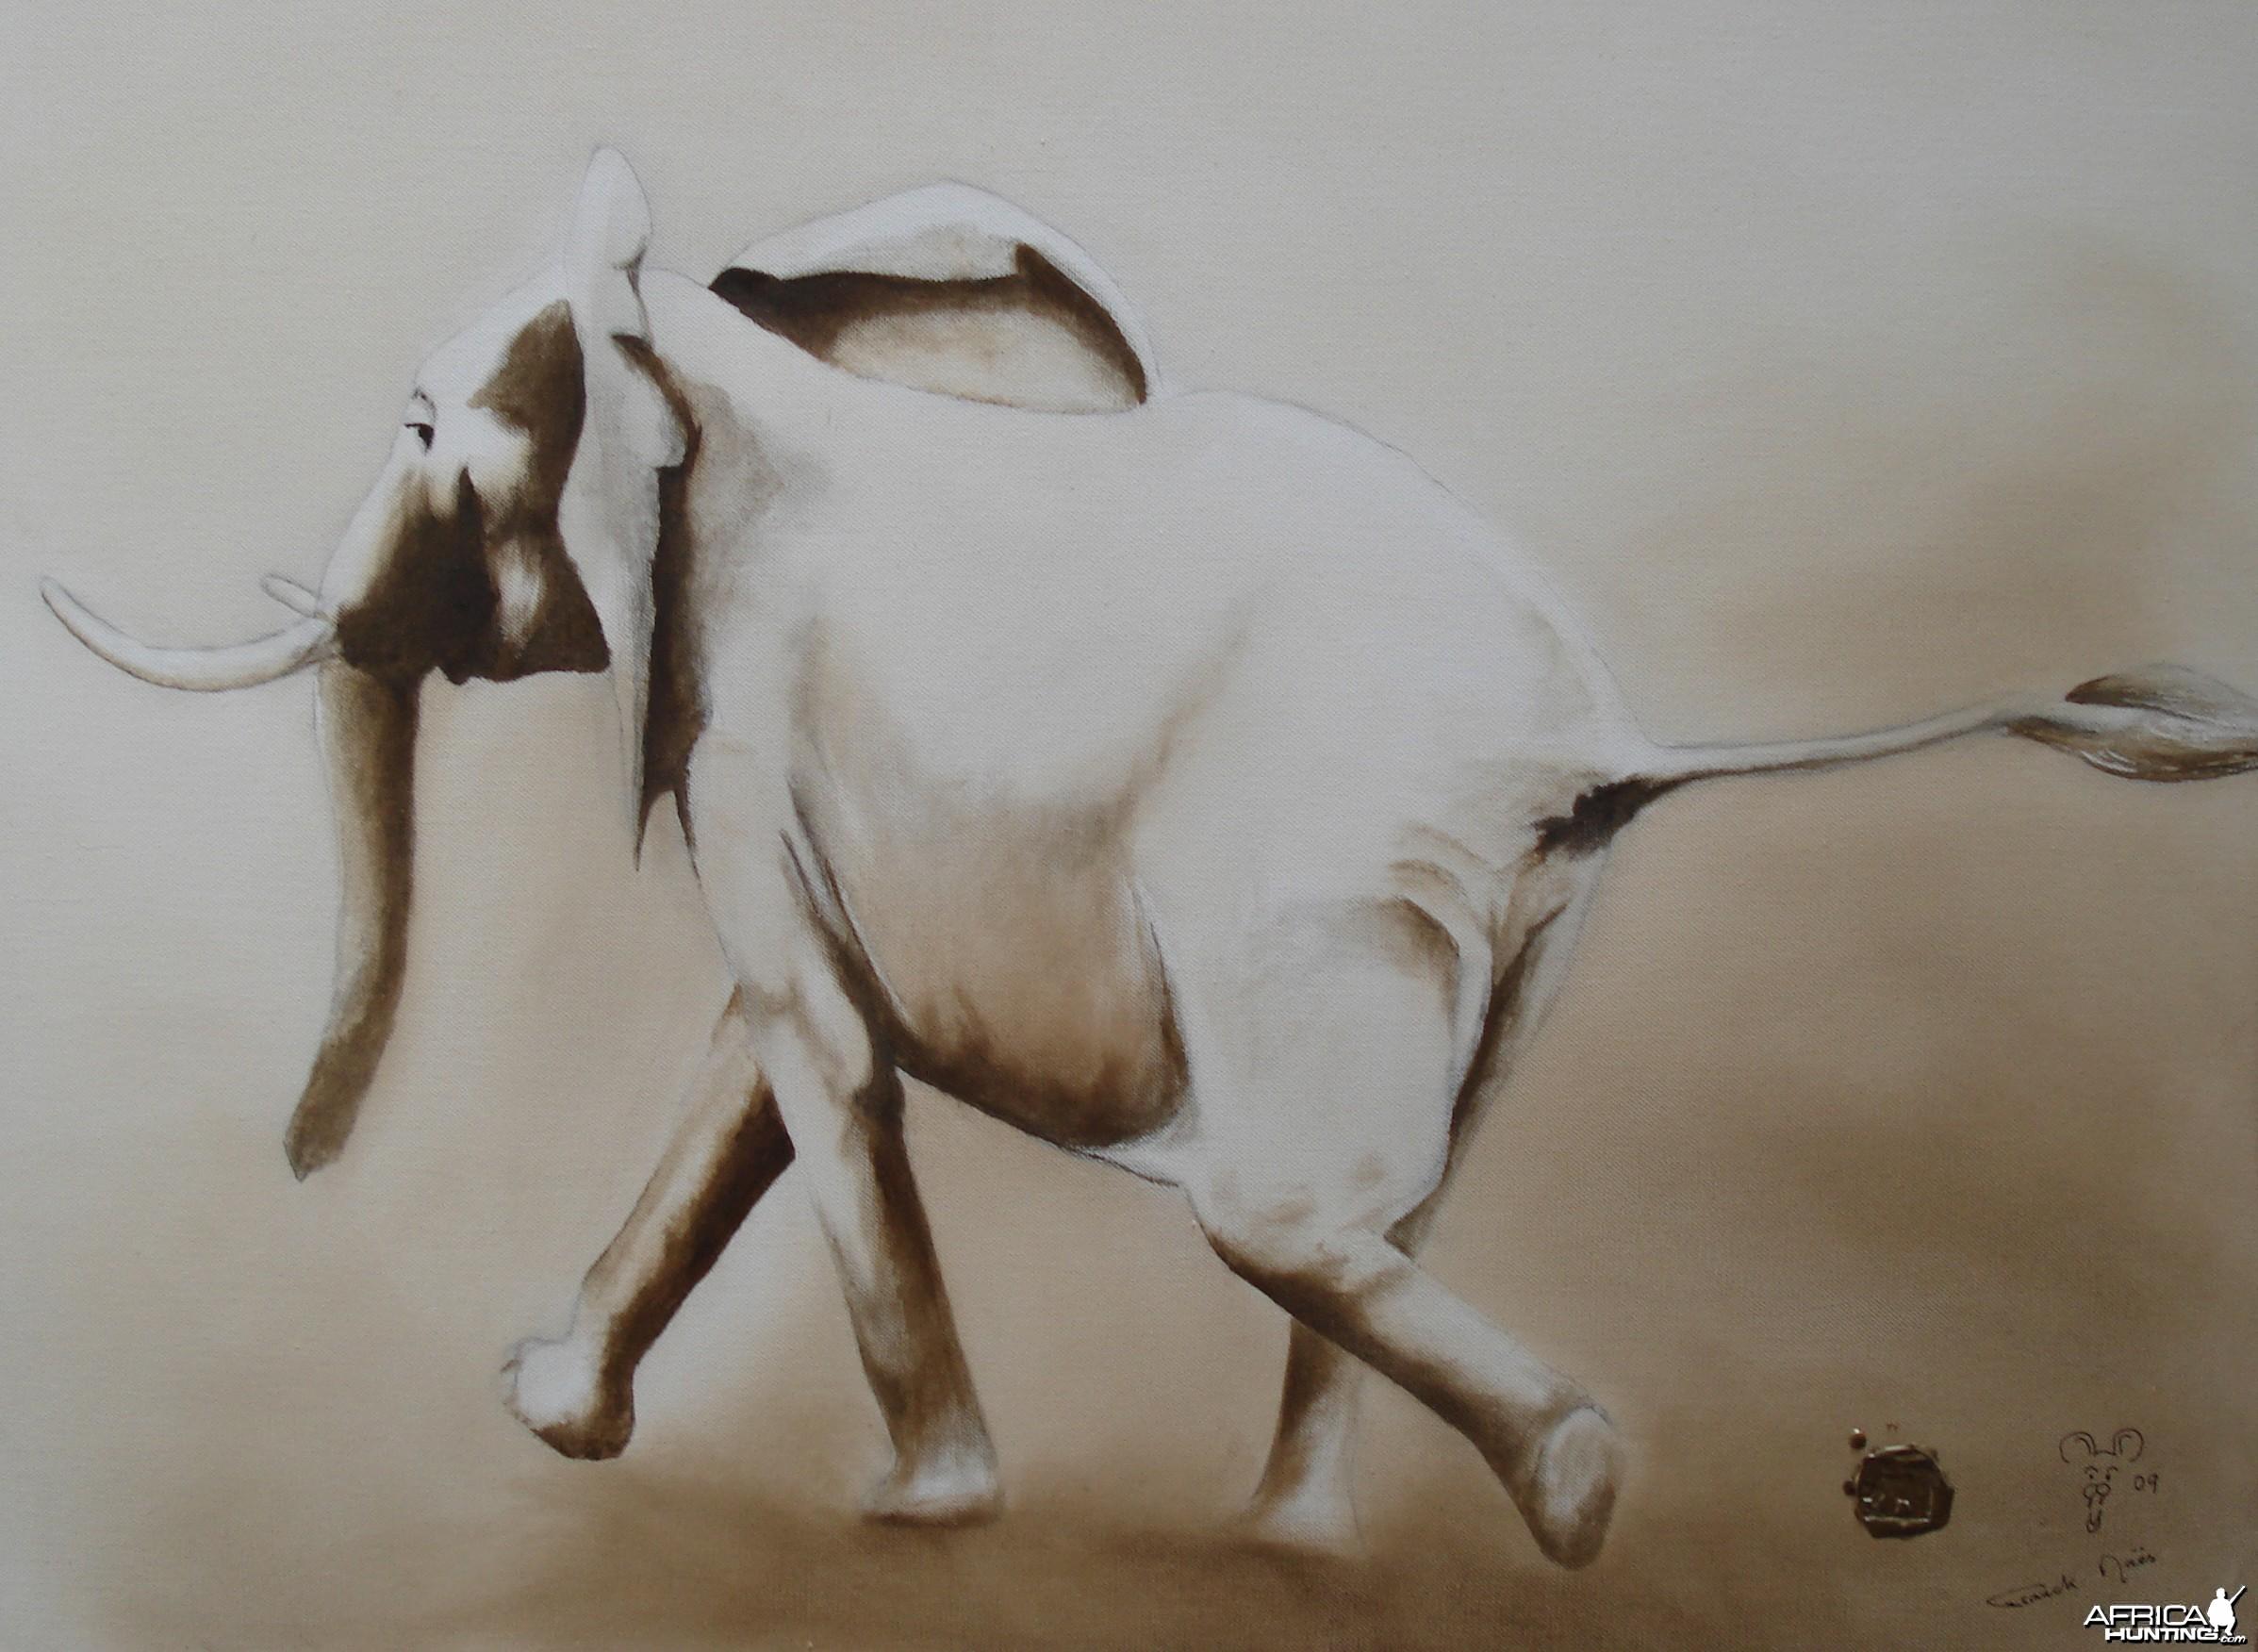 Upepo mbaya by Franck Maes